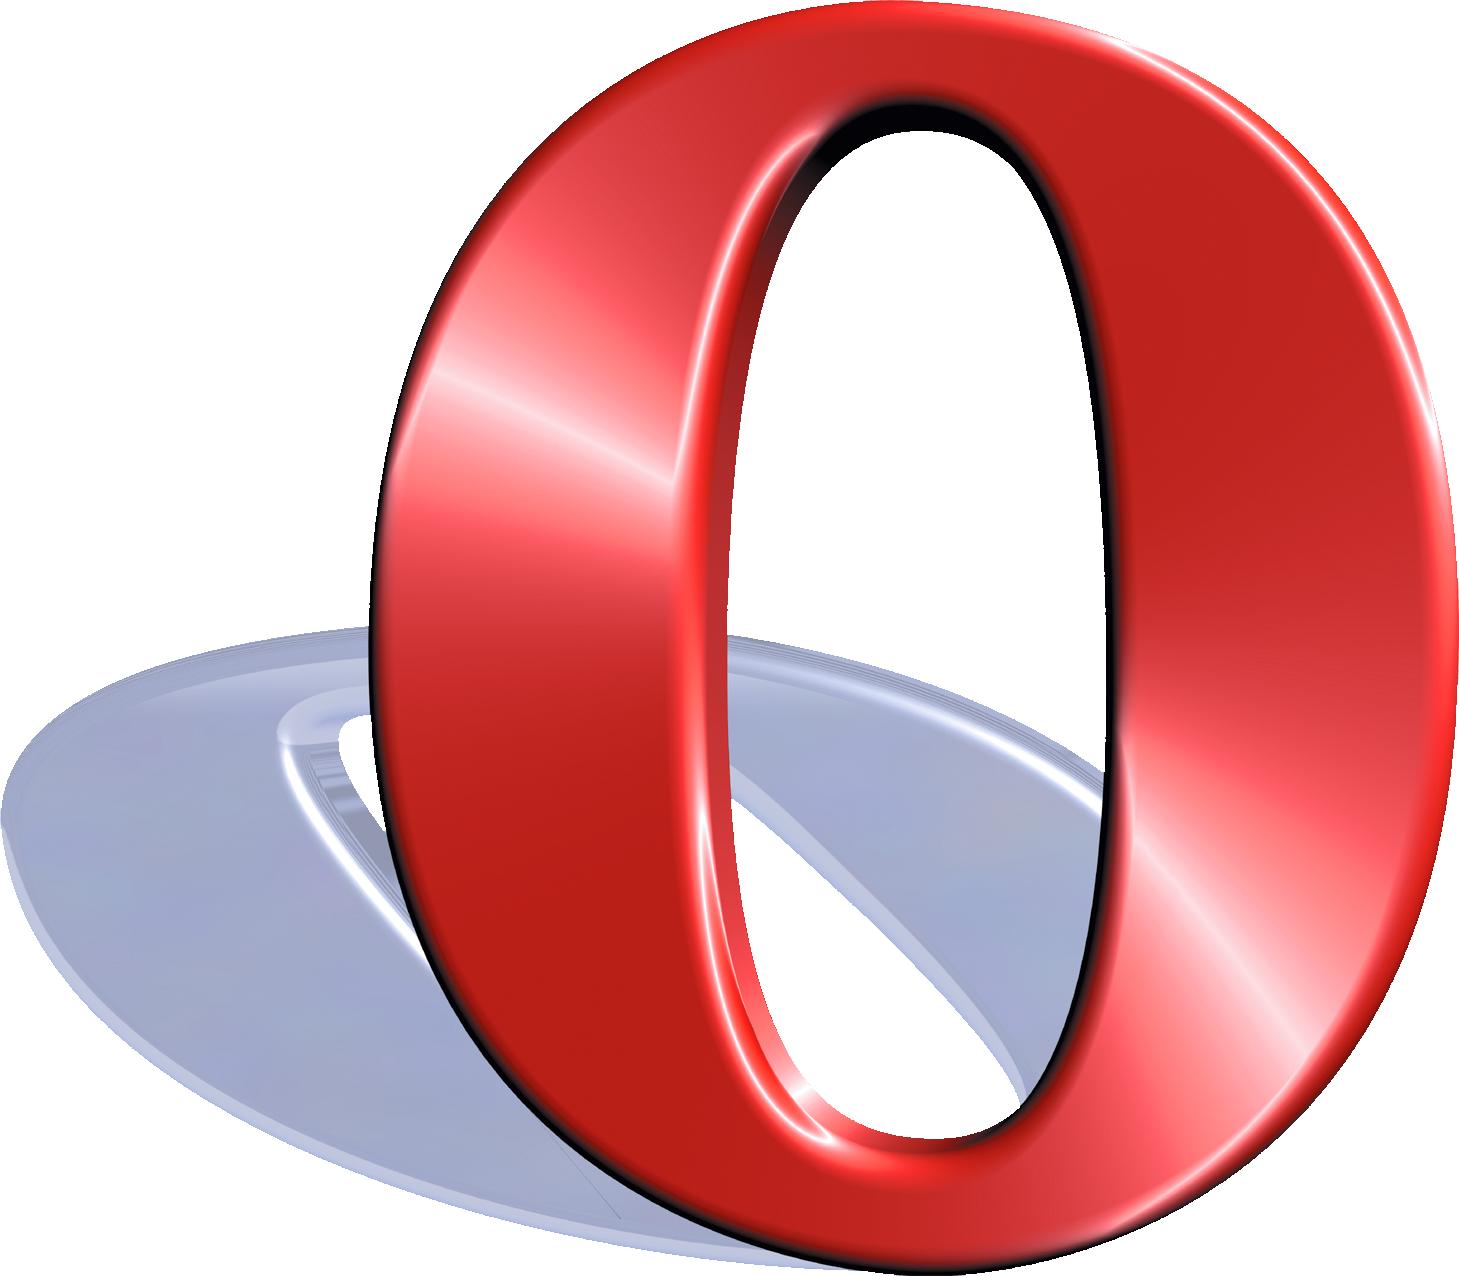 ���������� Opera 9.0 Software